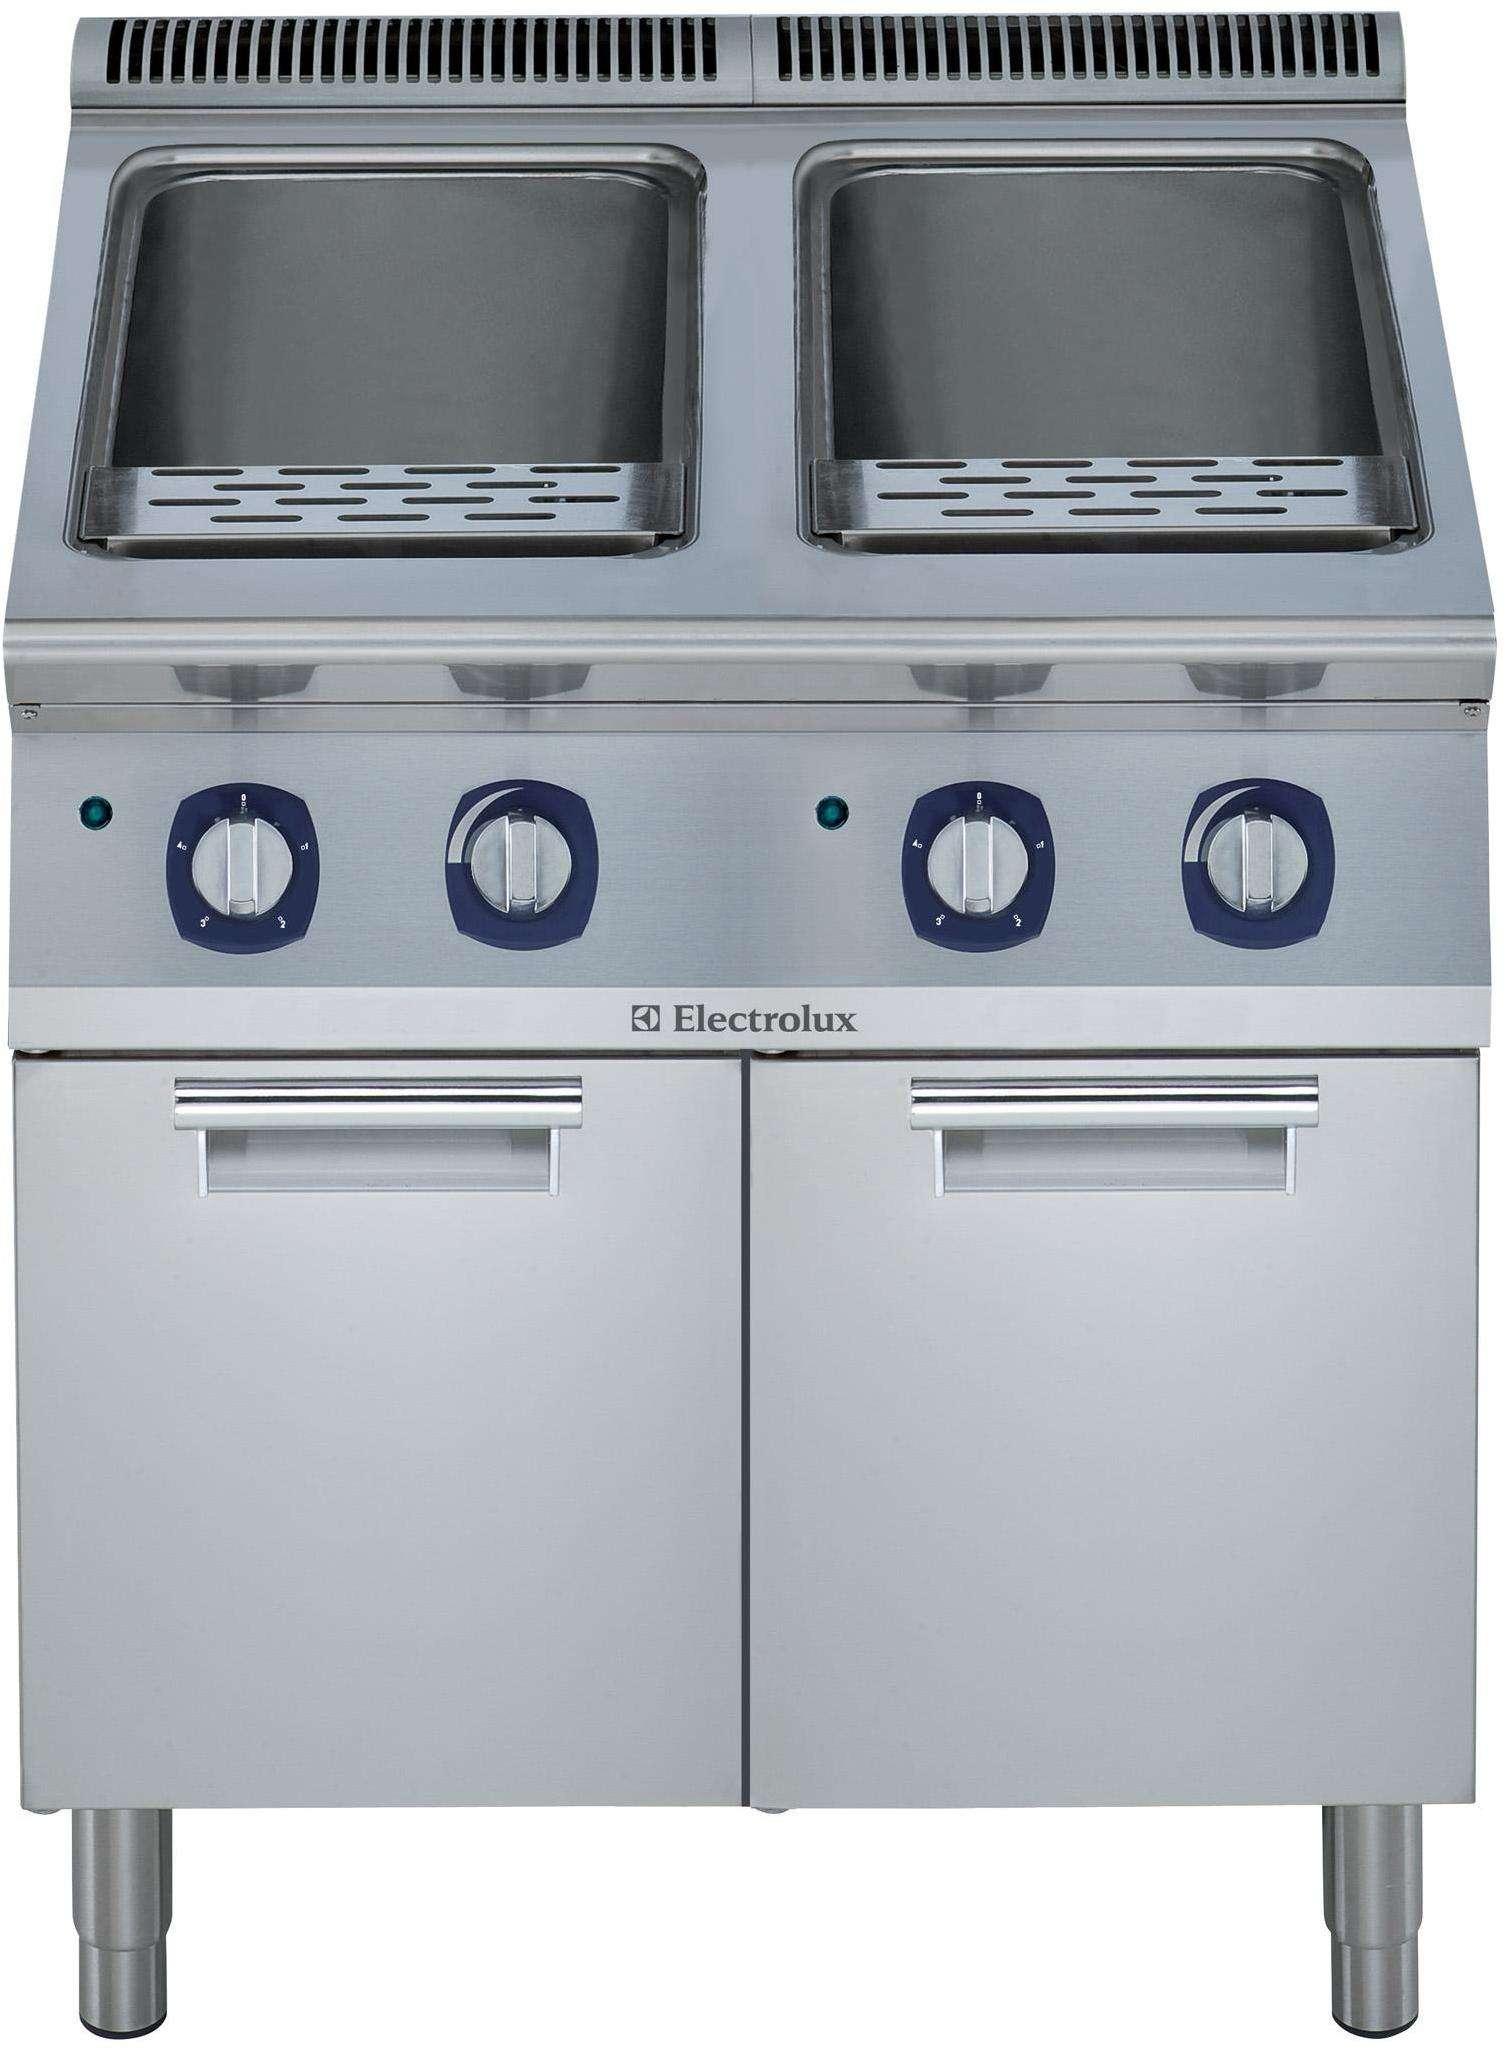 Dorable Neer Dosa Subbus Kitchen Composition - Kitchen Cabinets ...